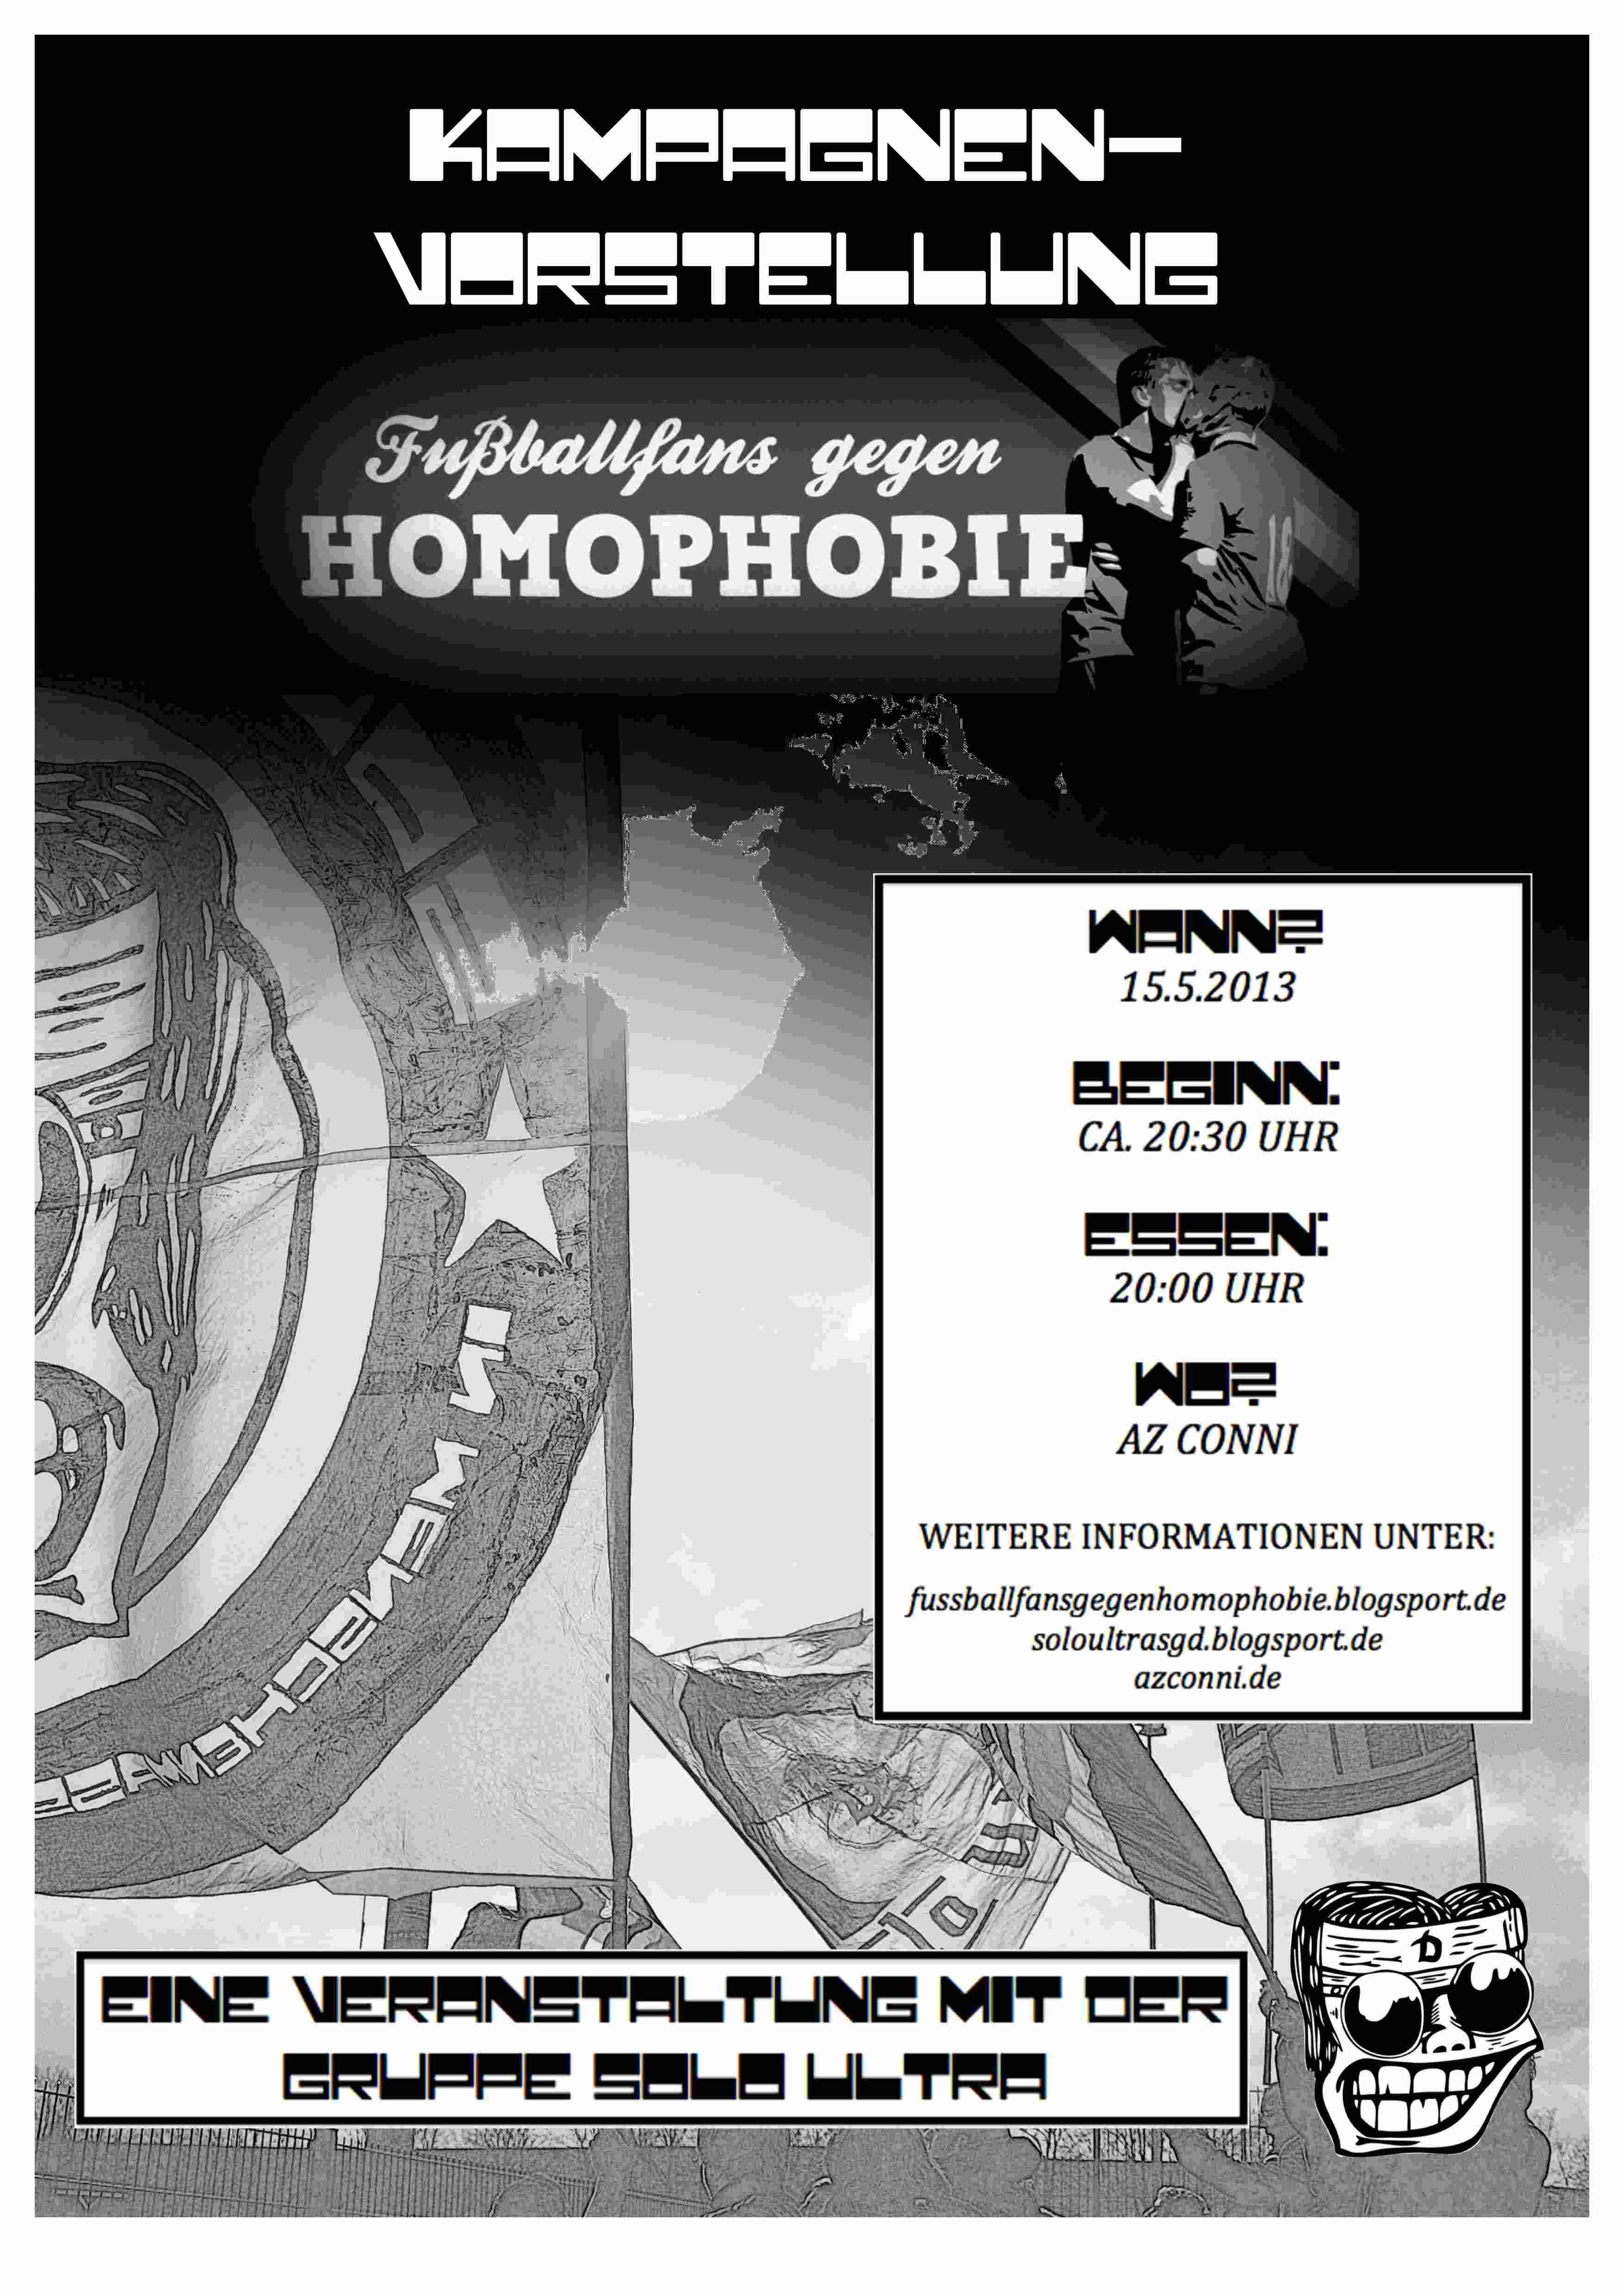 plakat_gg_Homophobie